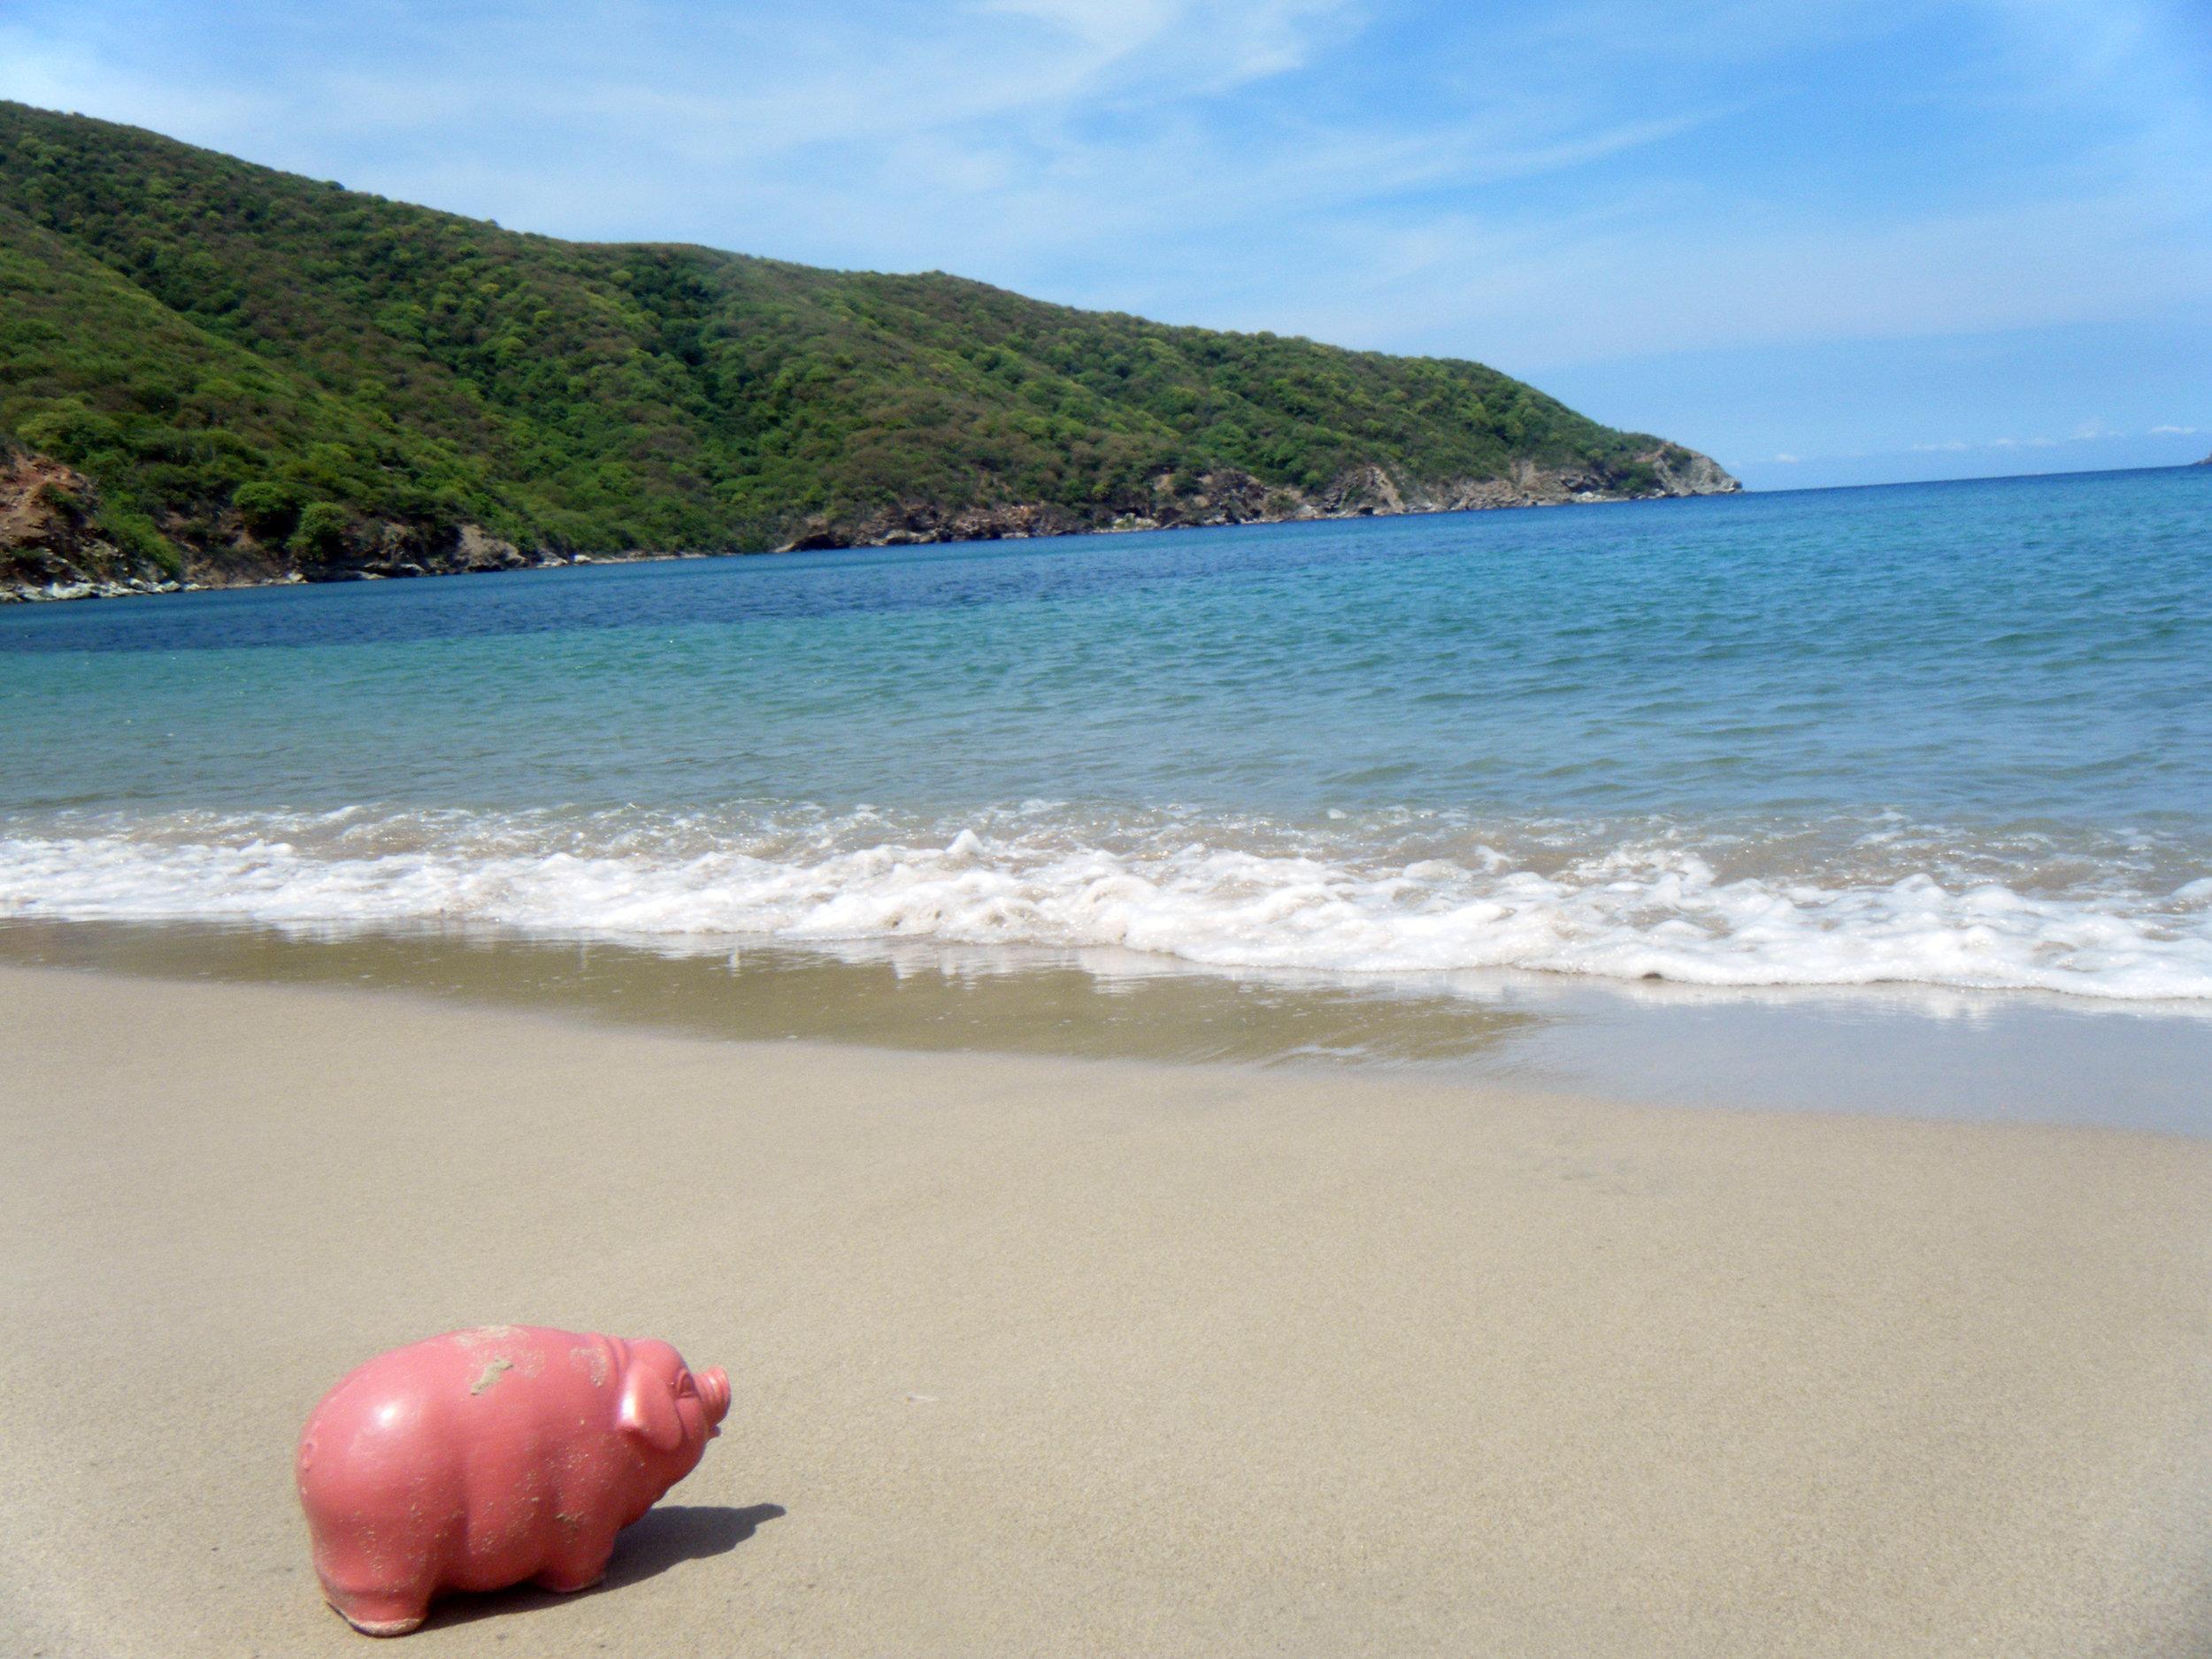 piggy beach.jpg